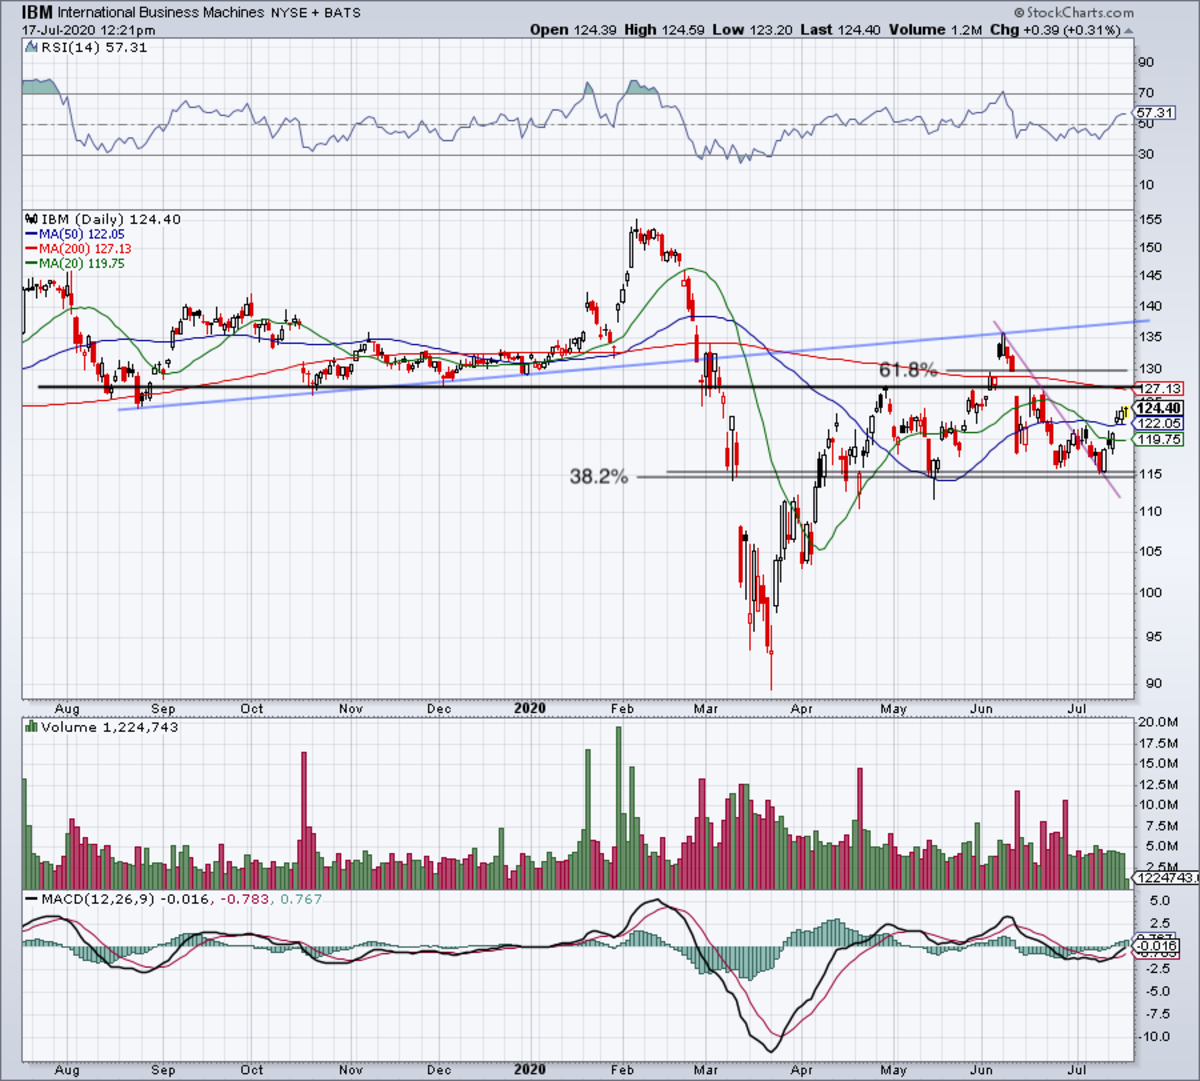 Daily chart of IBM stock.